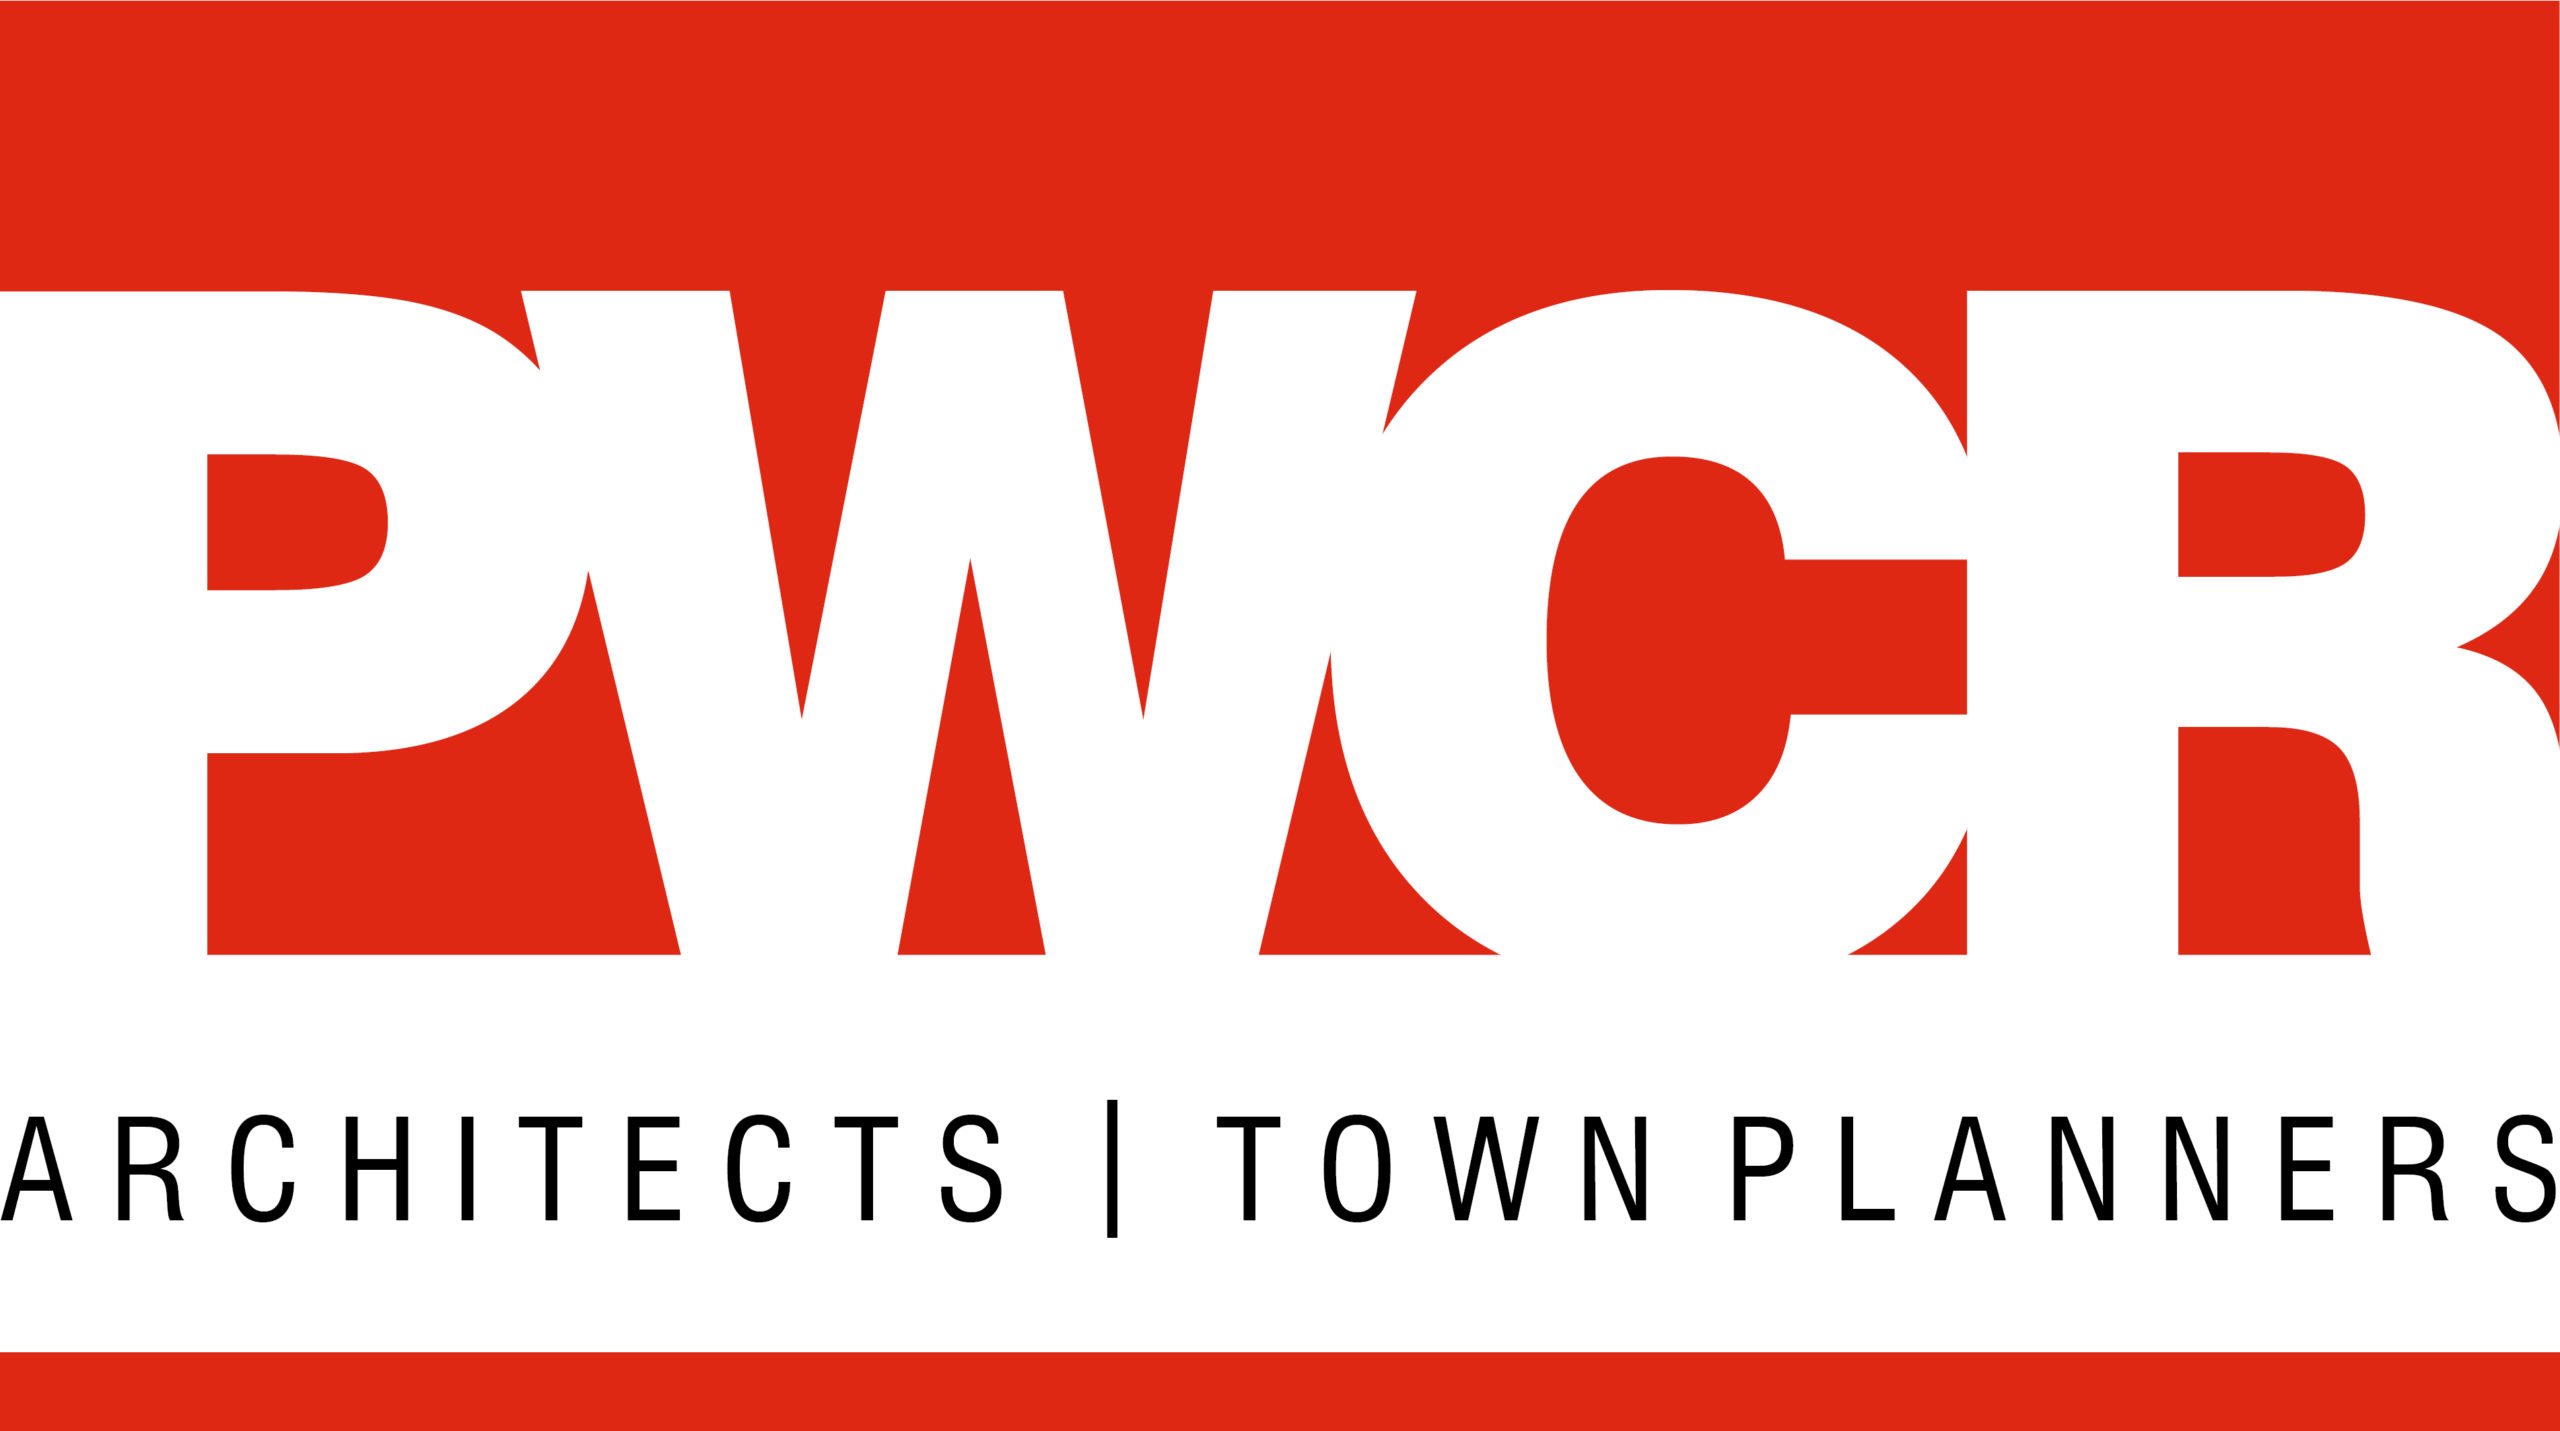 PWCR - Proctor Watts Cole Rutter